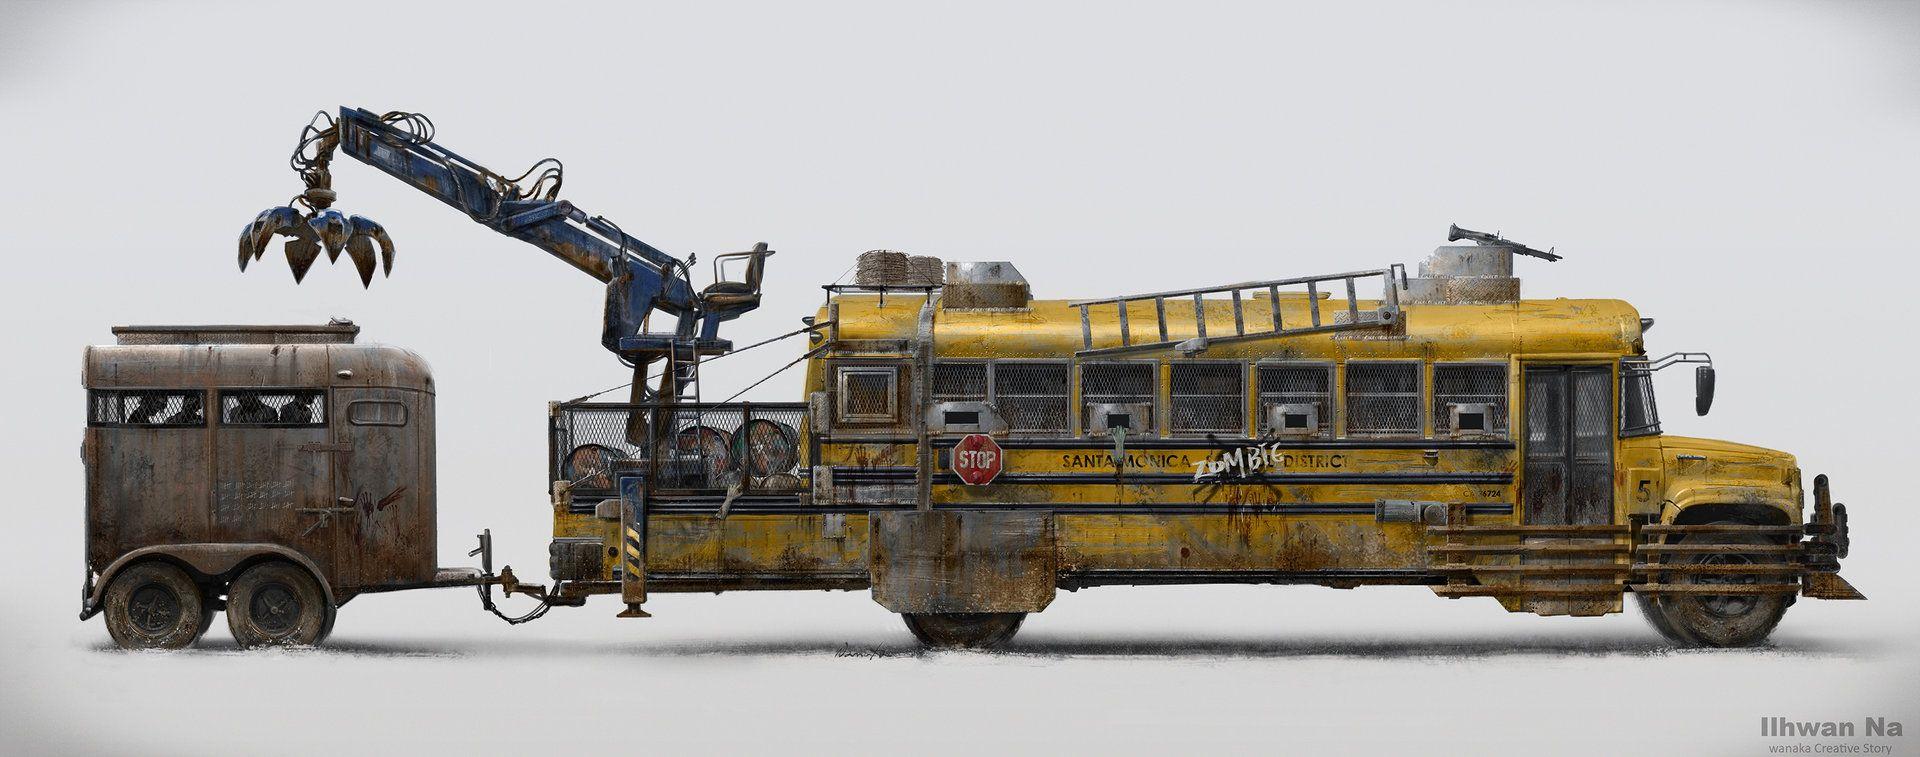 Vehicle bus trailer apocalypse artstation zombie school ilhwan na